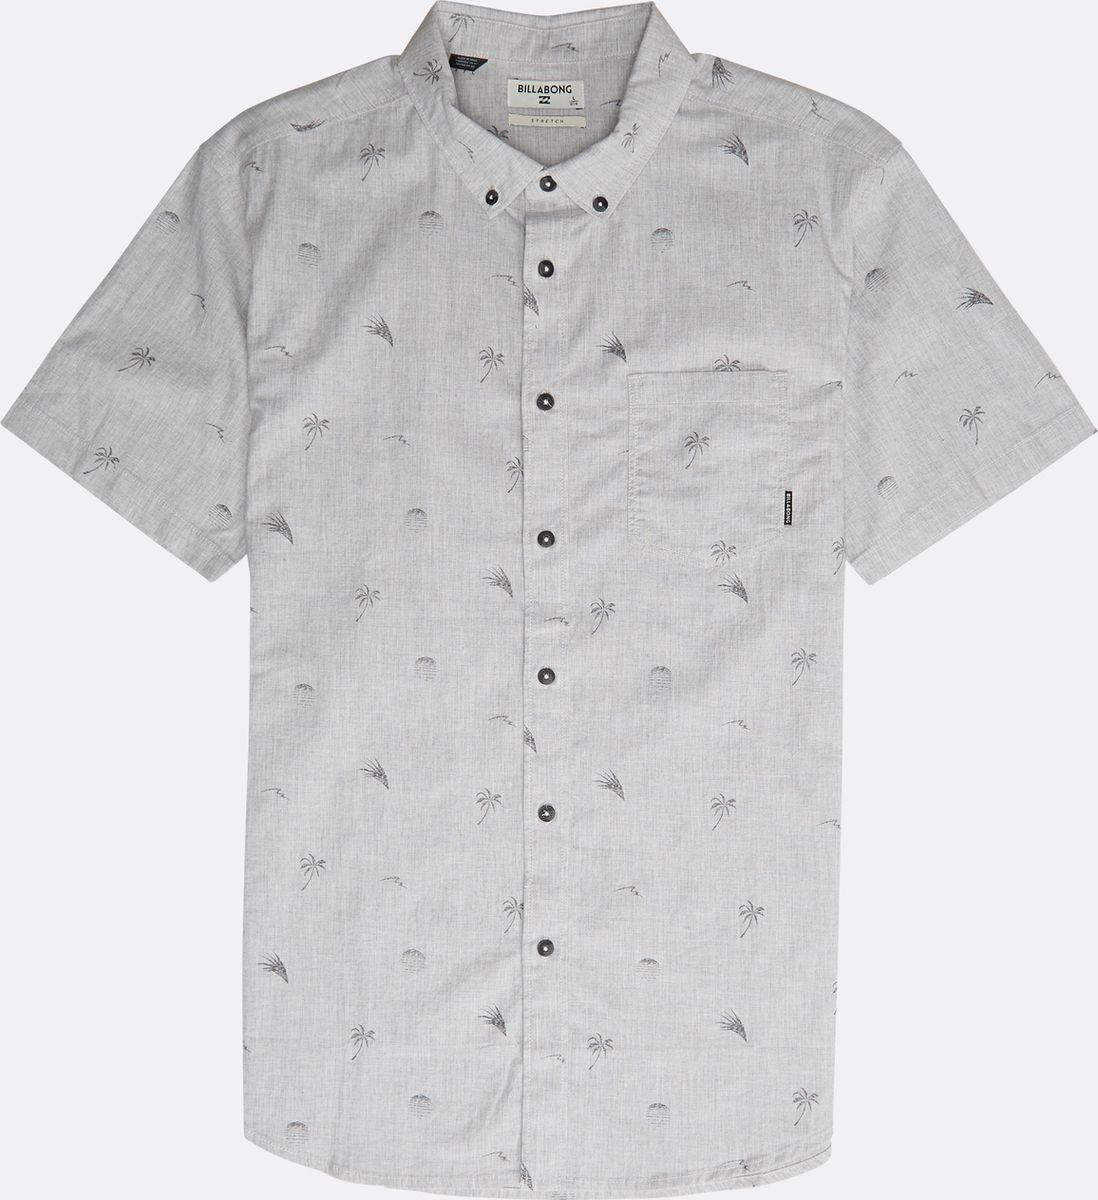 Рубашка Billabong Sundays Mini Ss рубашка billabong faded shirt light steel